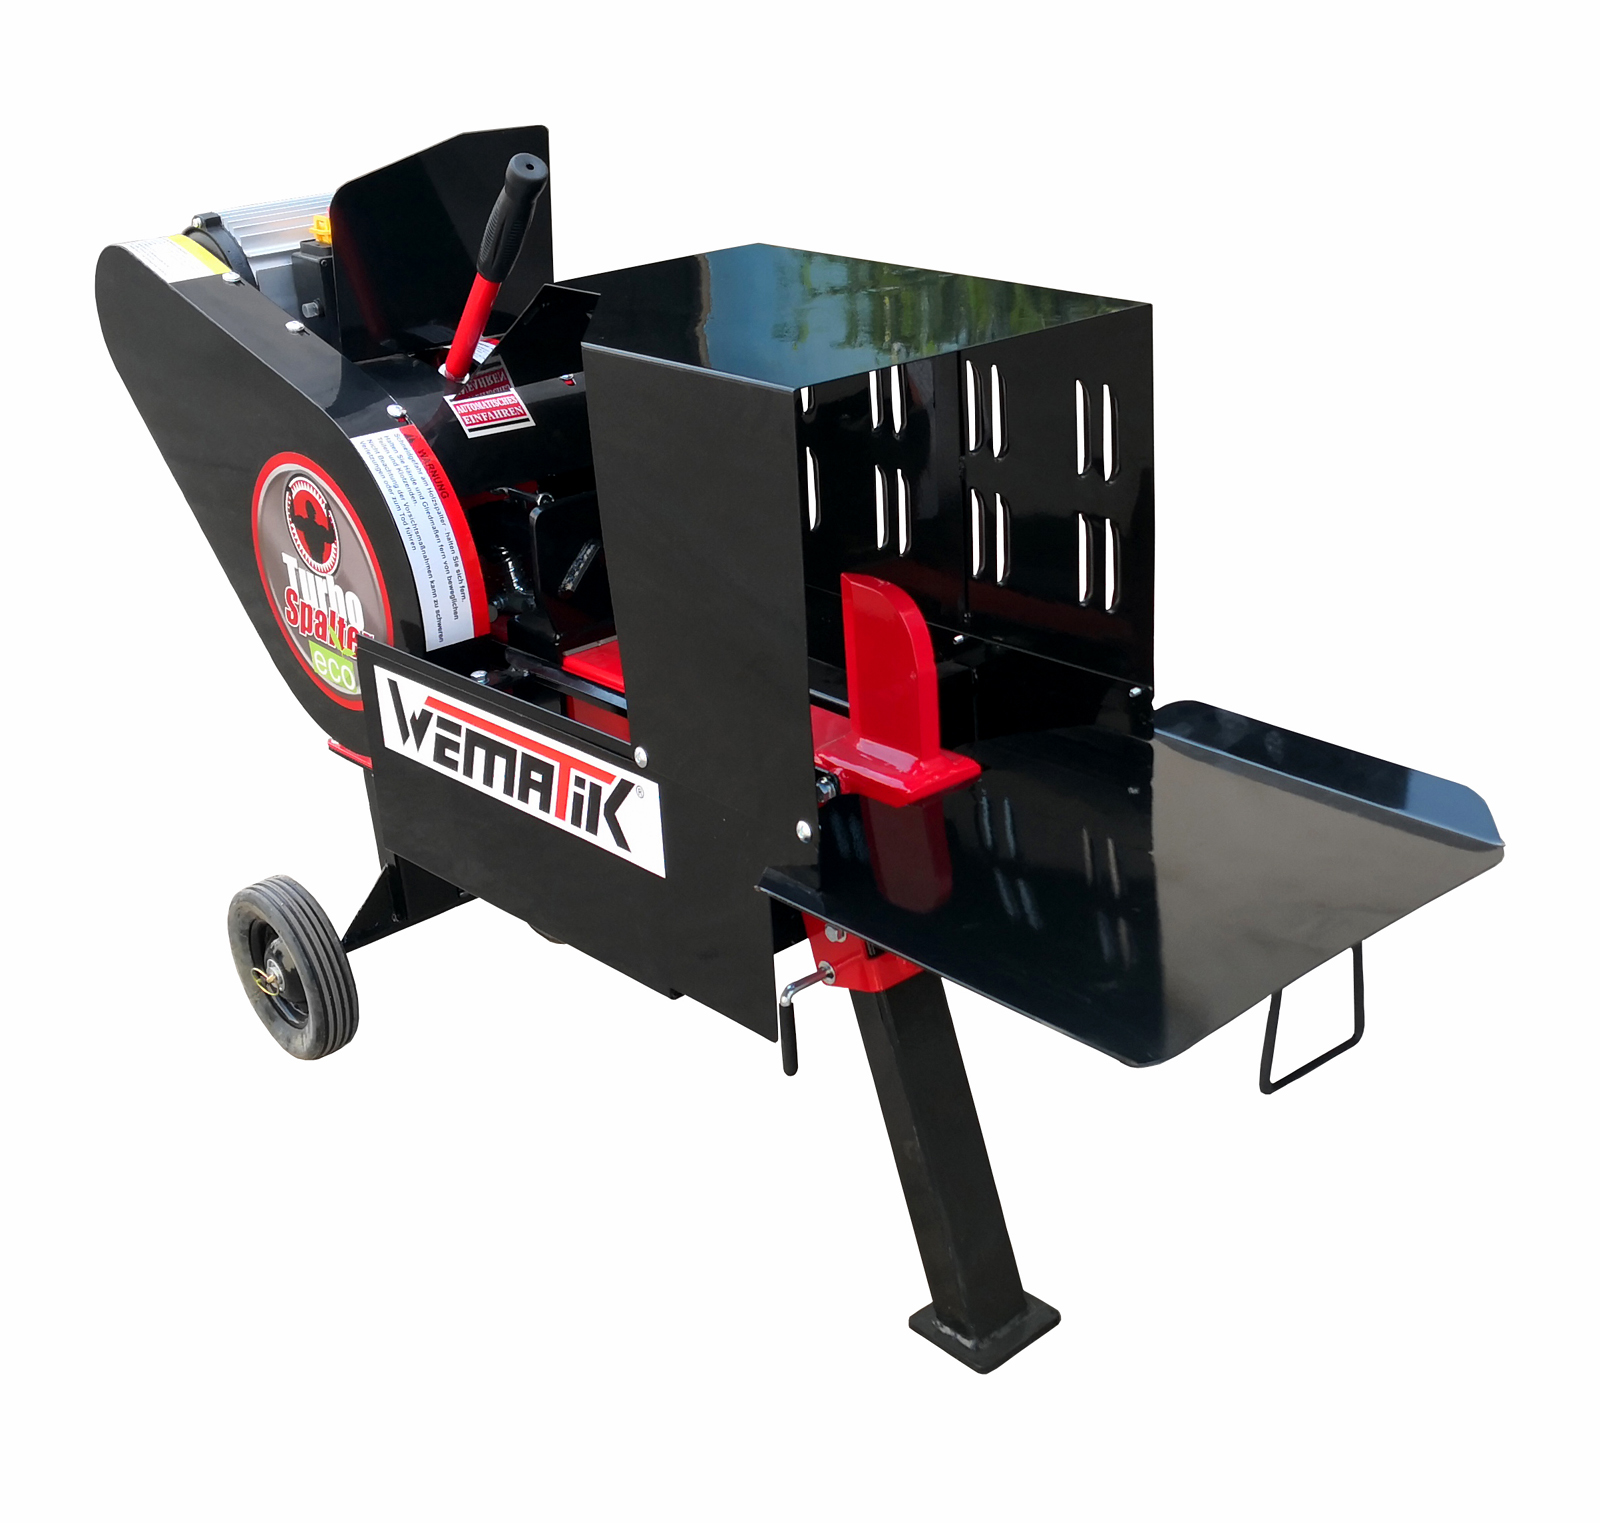 Turbo Spalter ECO Schwungradspalter 8 Tonnen